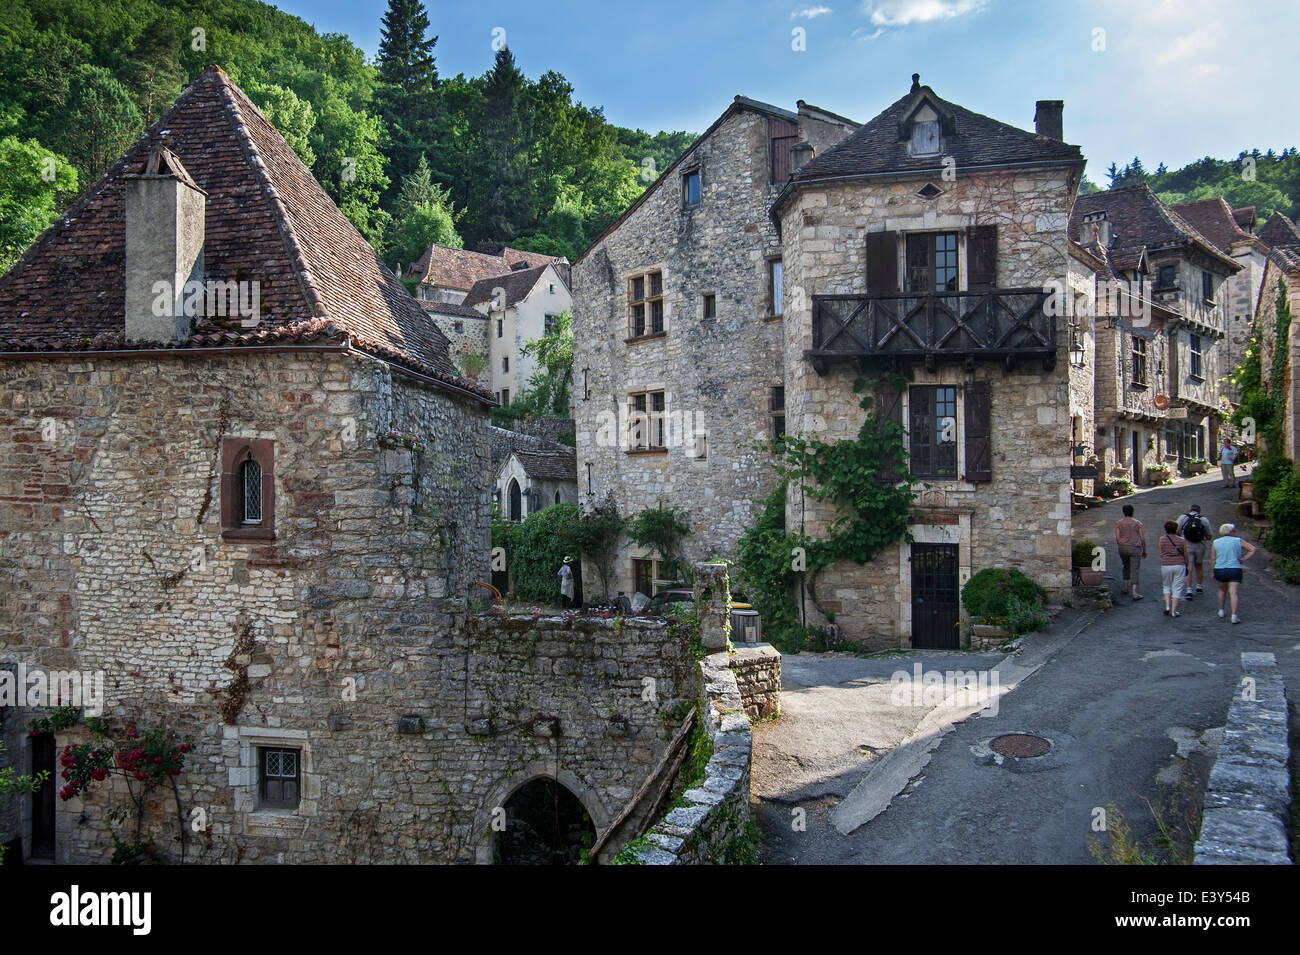 Tourists walking through the medieval village Saint-Cirq-Lapopie, Lot, Midi-Pyrénées, France - Stock Image